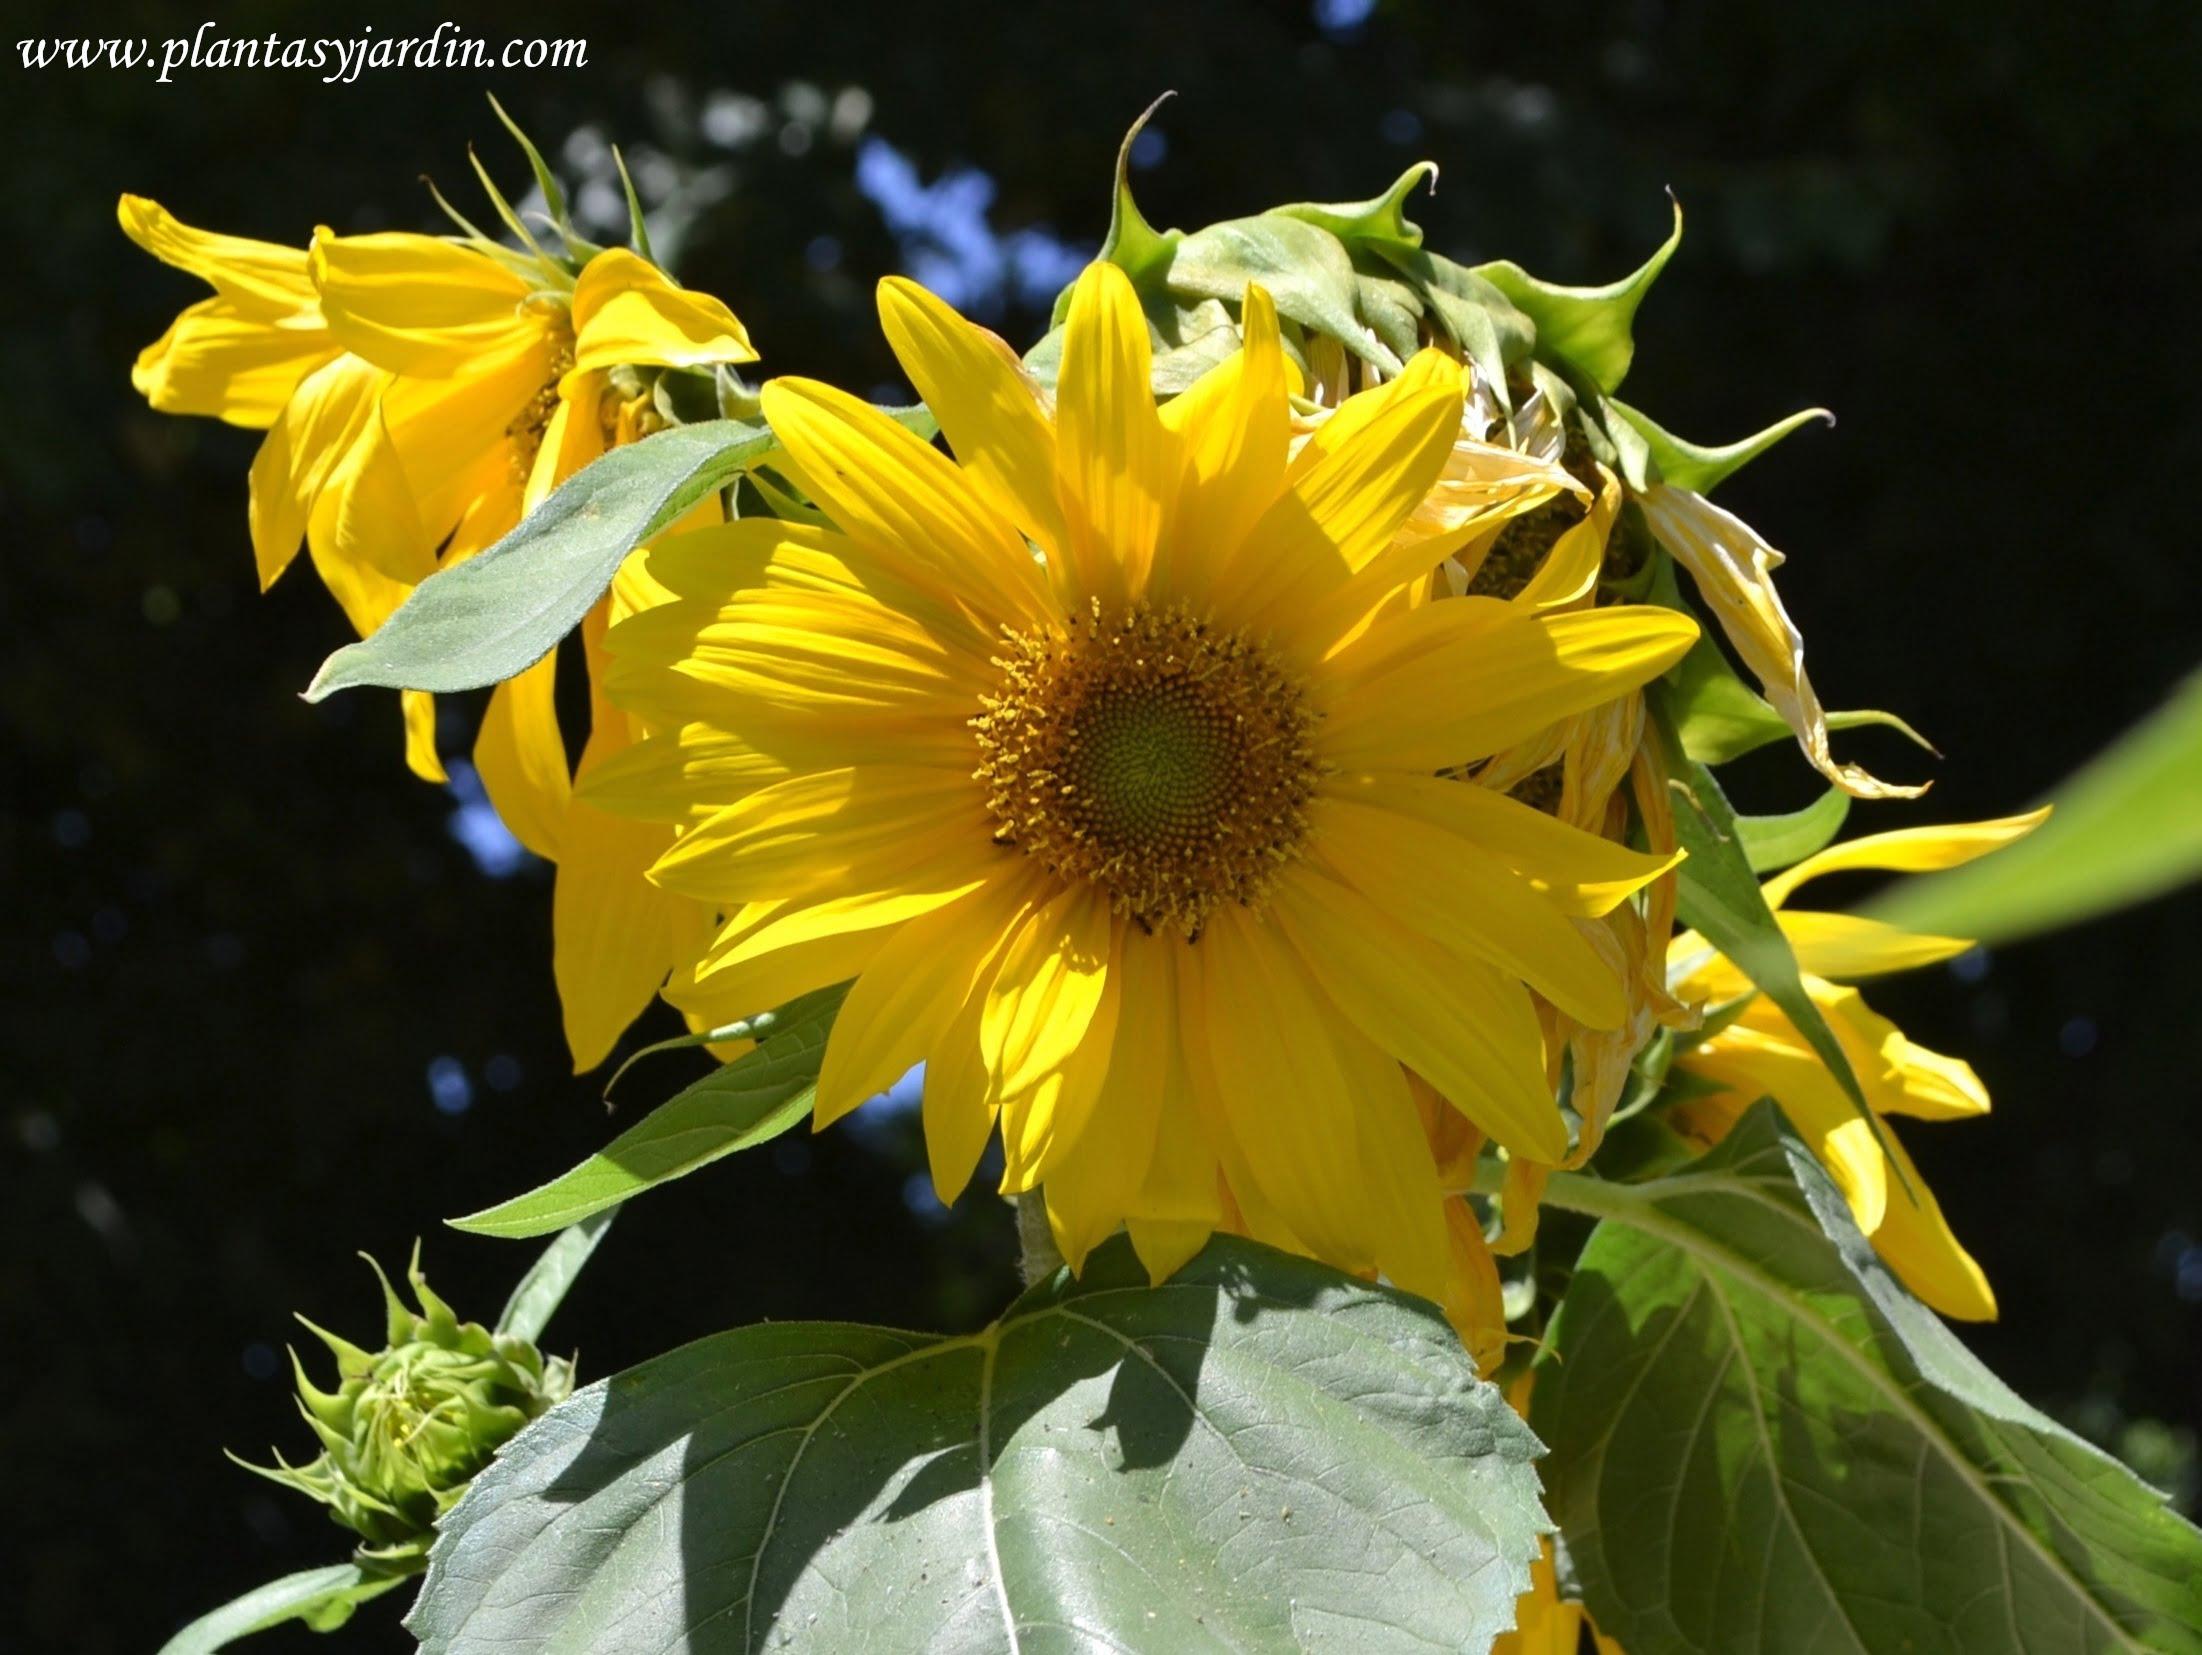 Girasol-Helianthus annuus en verano